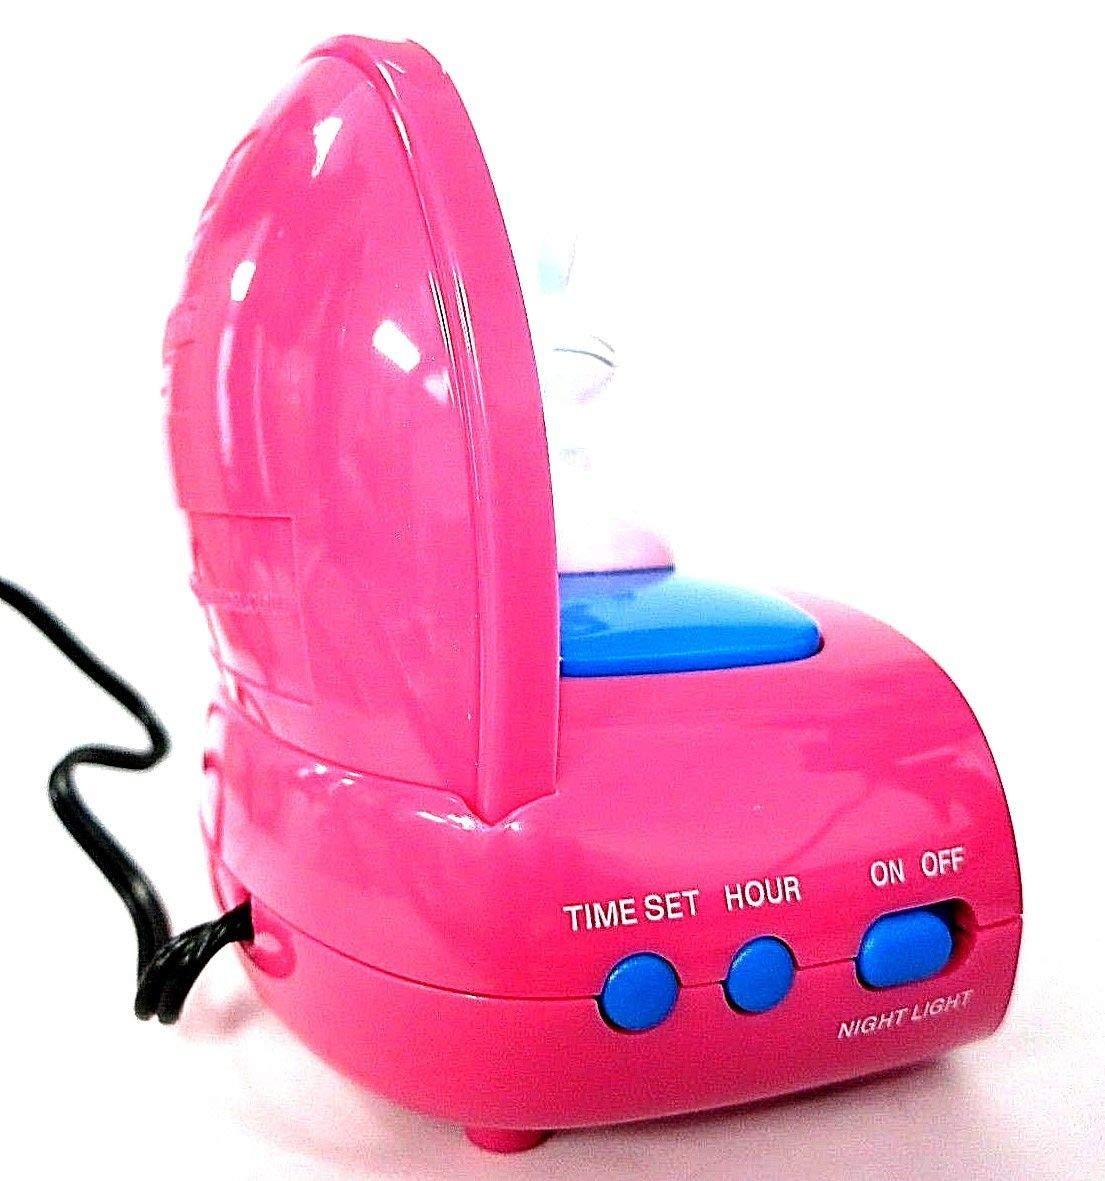 makes rude remarks or comments Its Happy Bunny Scenic Nightlight Alarm Clock Jim Benton